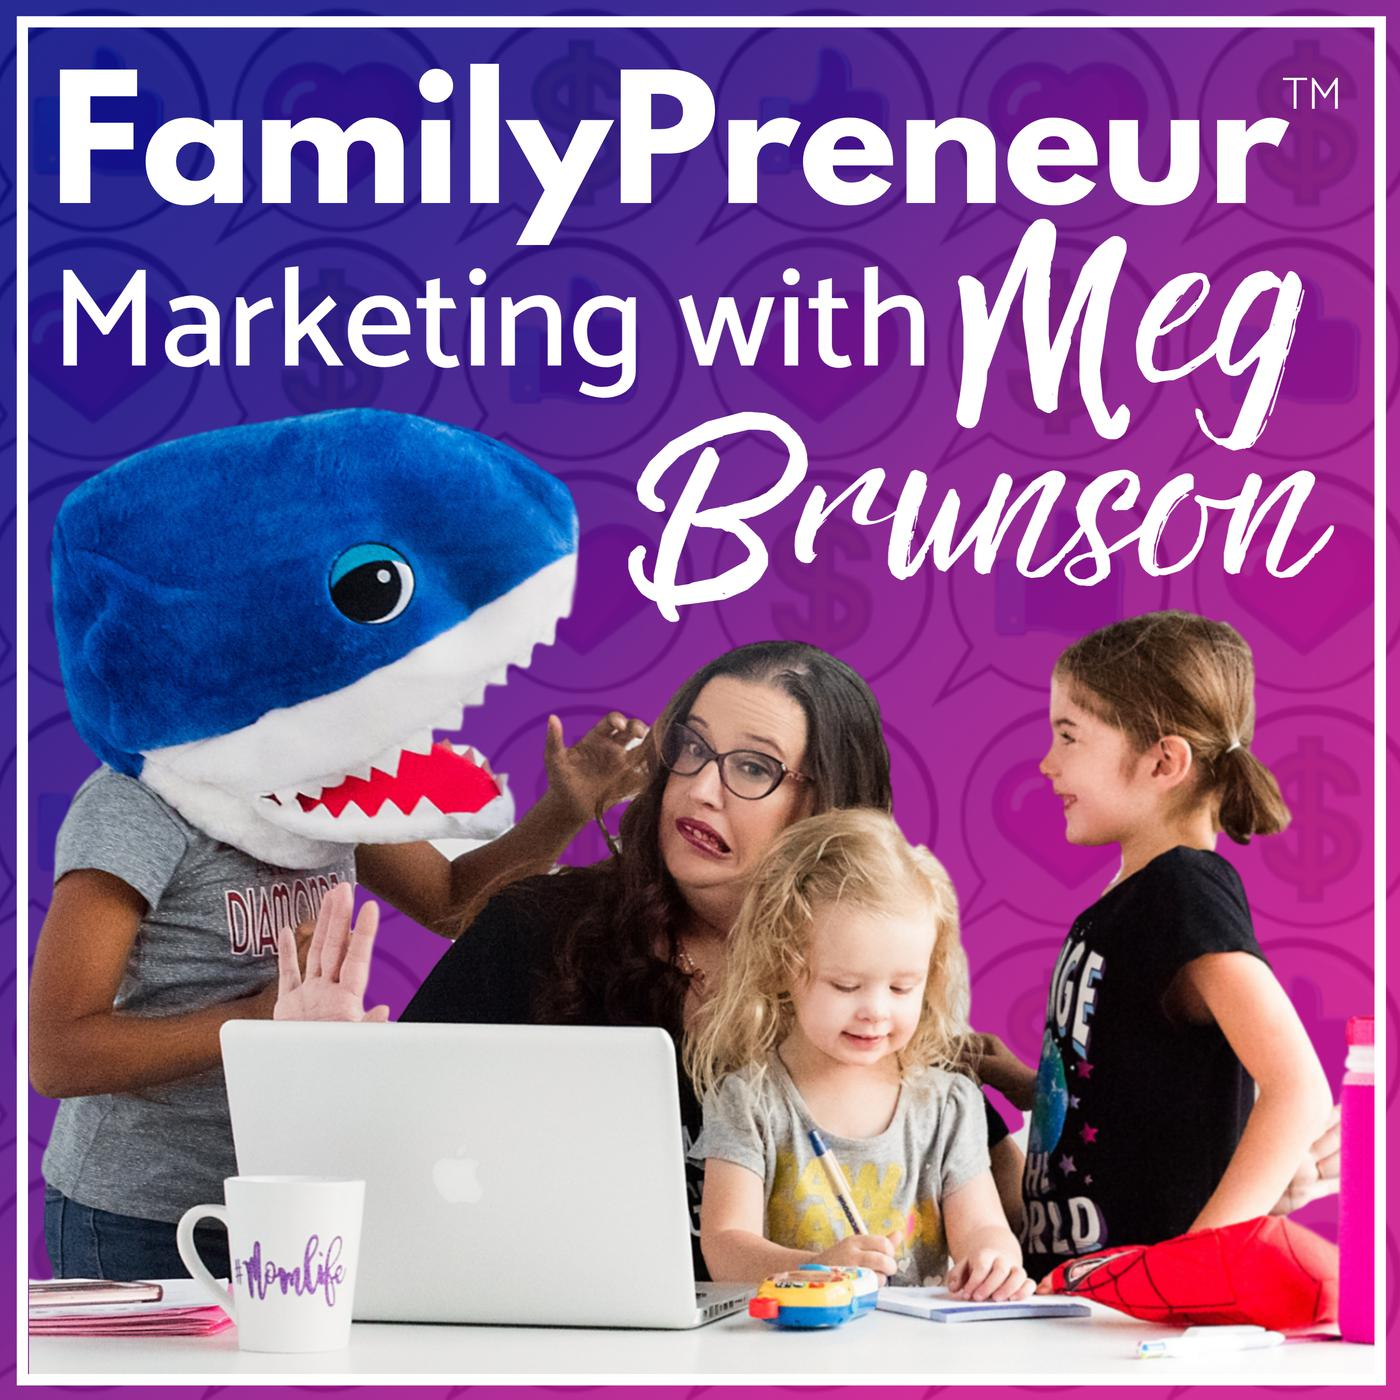 FamilyPreneur:Marketing with Meg Brunson and Amanda Tento